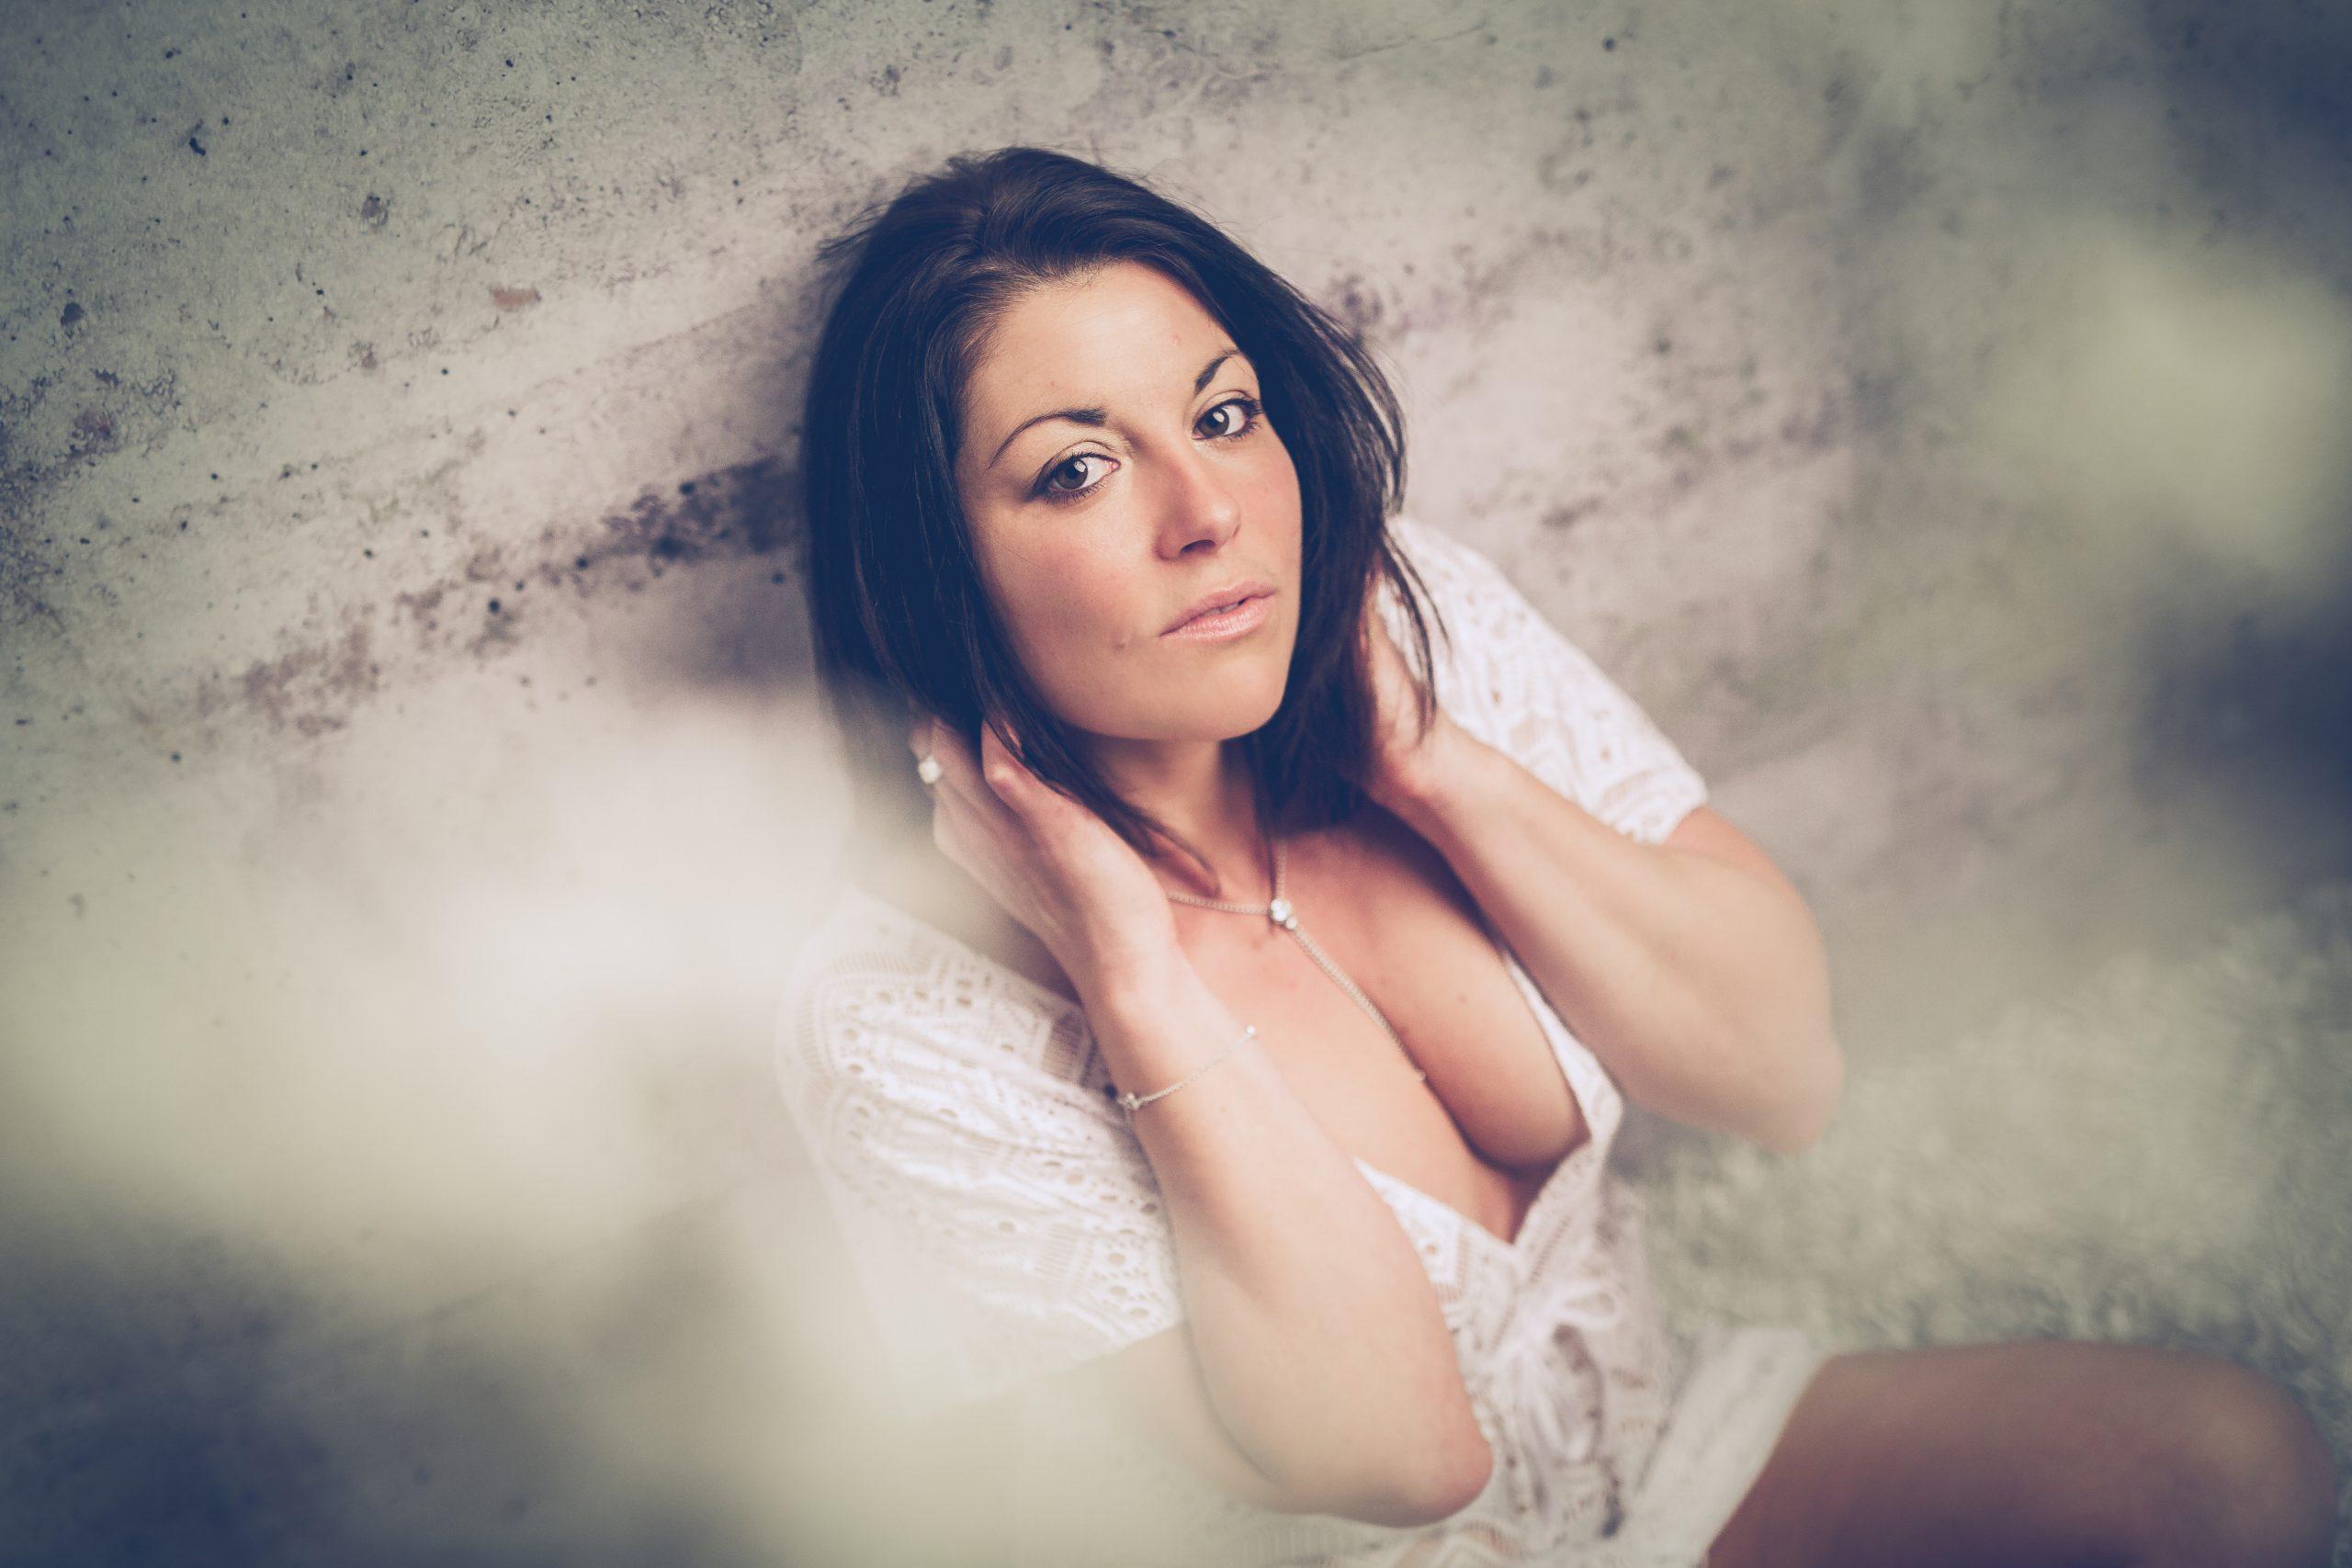 BEAUTY-und-BOUDOIR-aachen-erotikshooting-dueren-erotikfotos-alsdorf-erotikbilder-eschweiler-boudoirfotografie-aachen-Fotos-by-Domi-alsdorf-0185